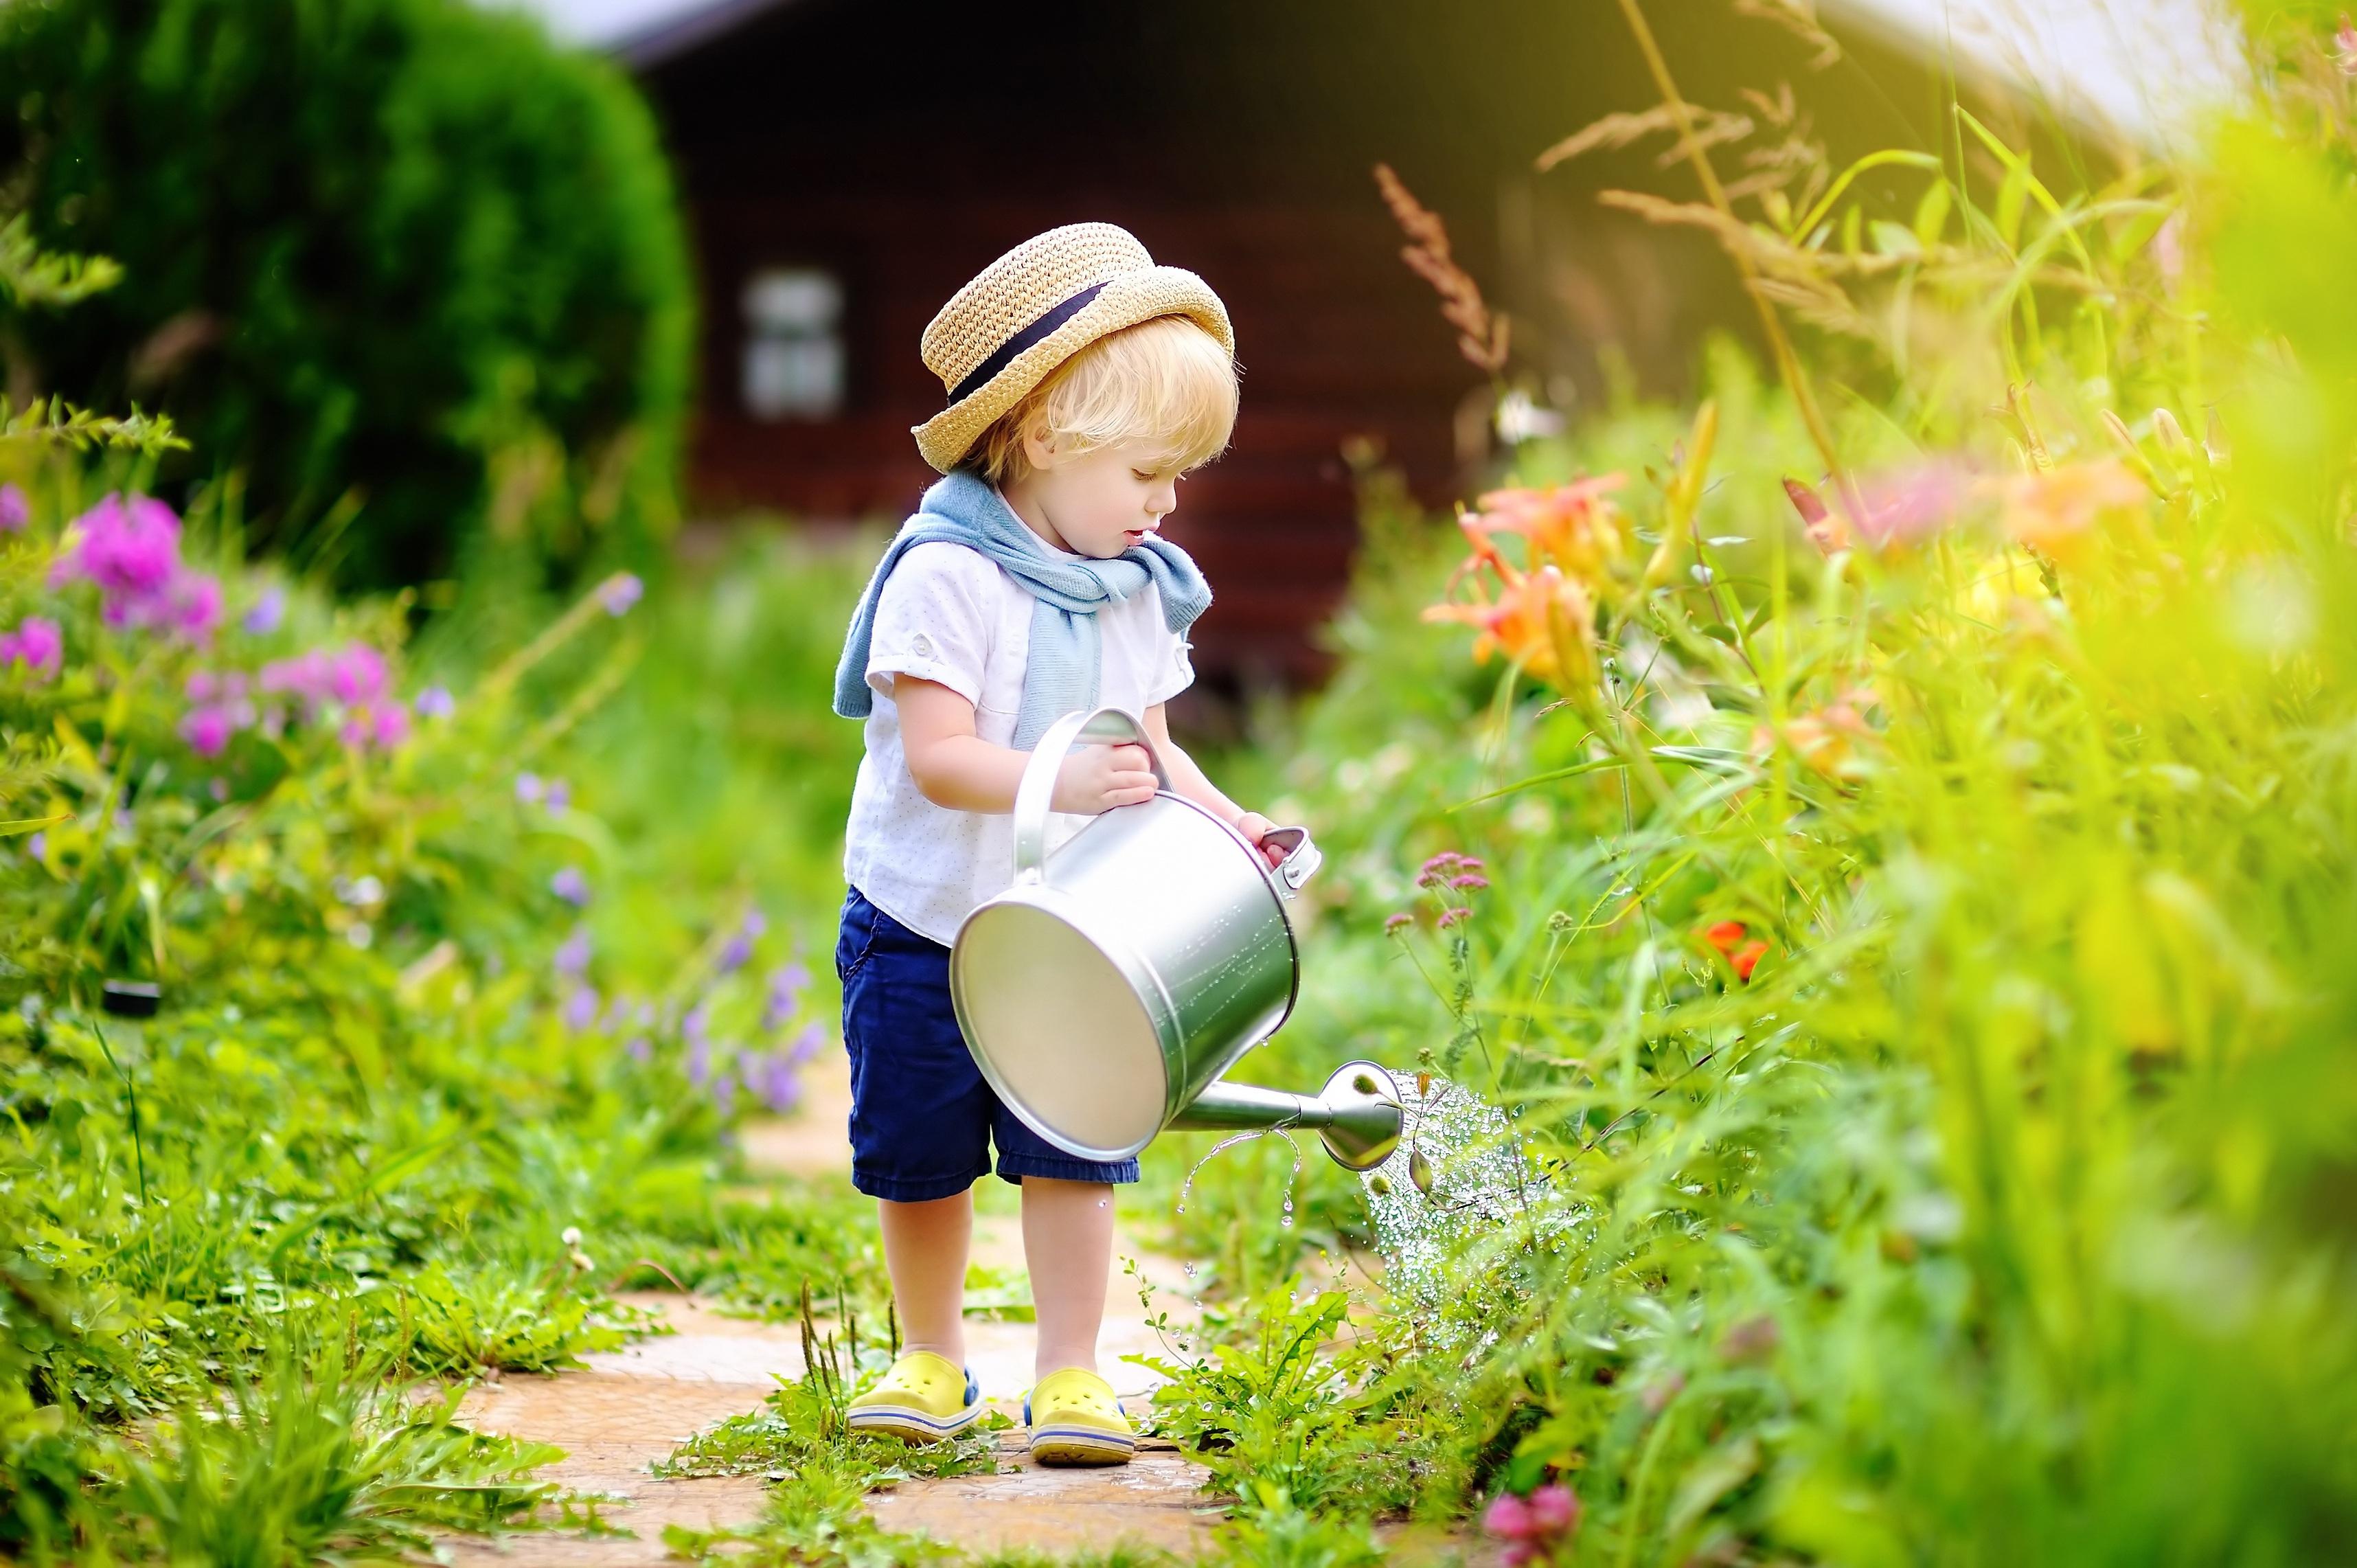 Cute toddler boy in straw hat watering plants in the garden at summer sunny day; Shutterstock ID 462068086; Title: britse babynamen